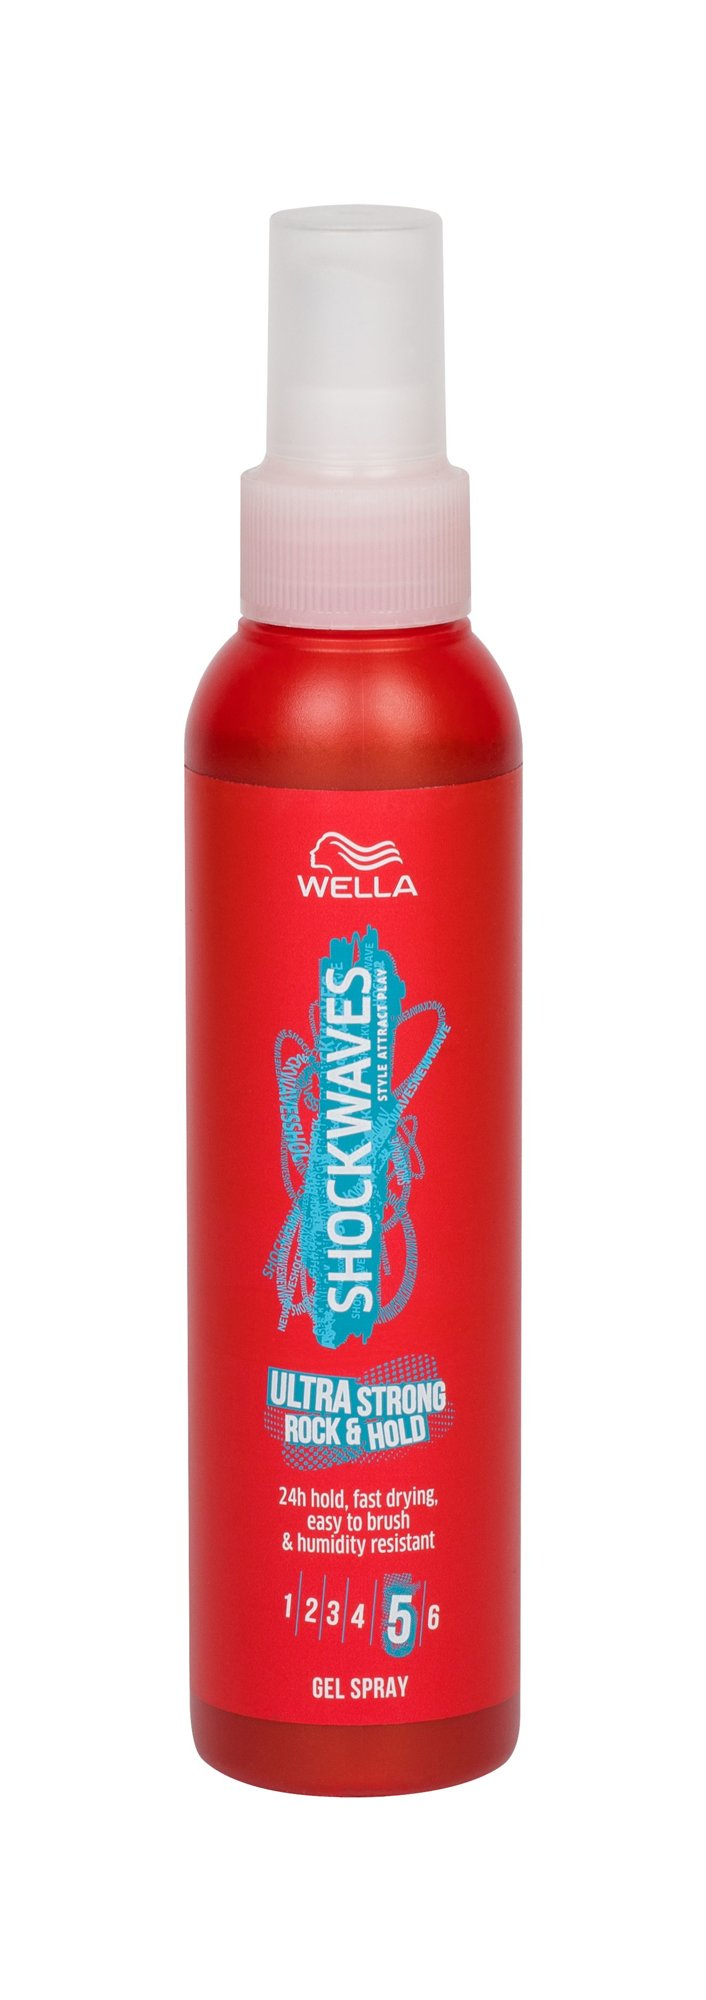 Wella Shockwaves Hair Spray 150ml